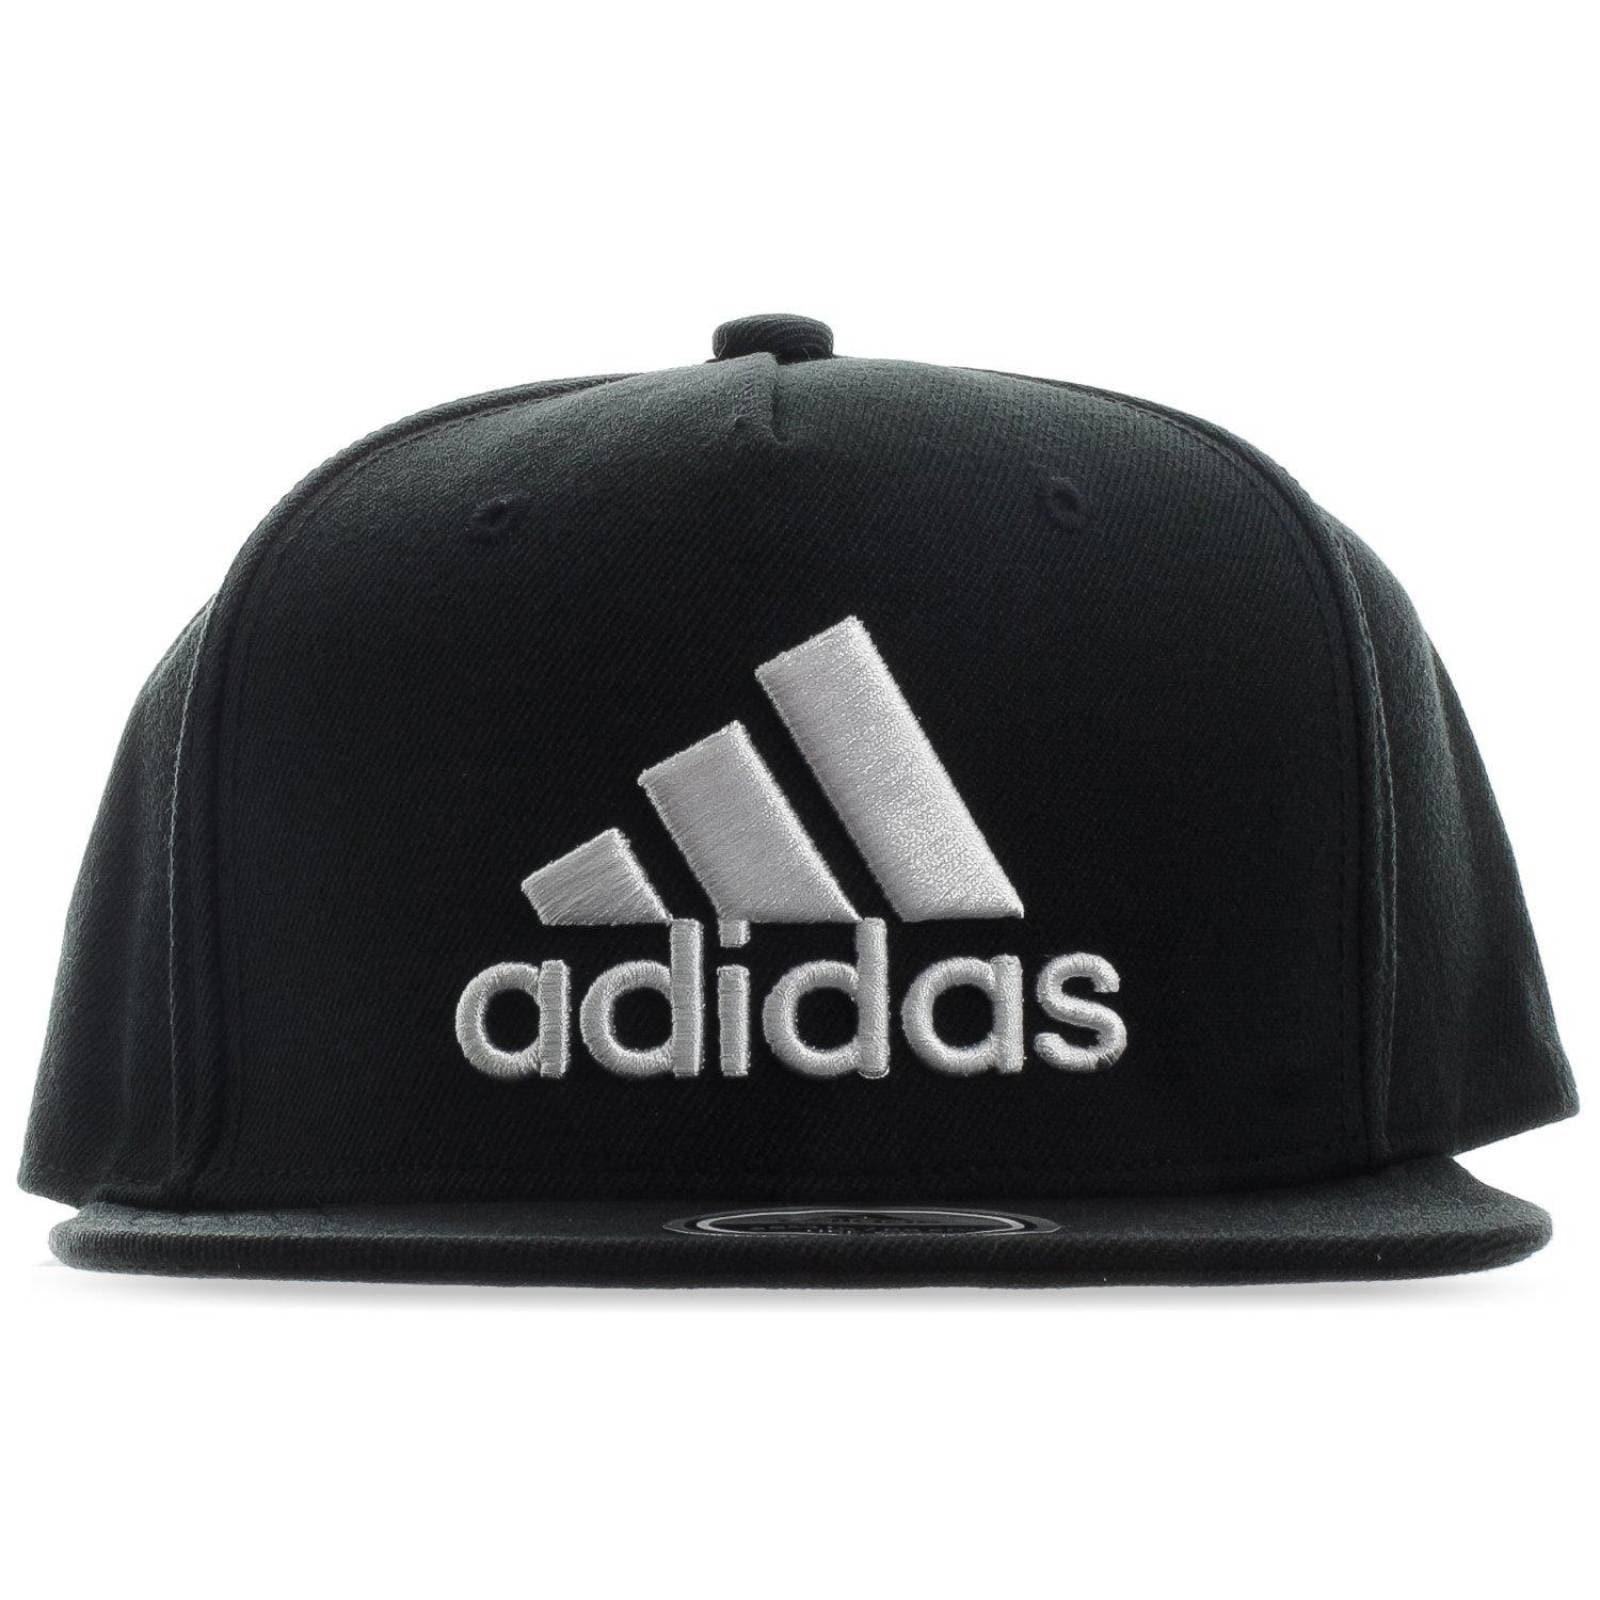 Departamento Tratar Vibrar  Gorra Adidas SnapBack Logo - FK0855 - Negro - Unisex